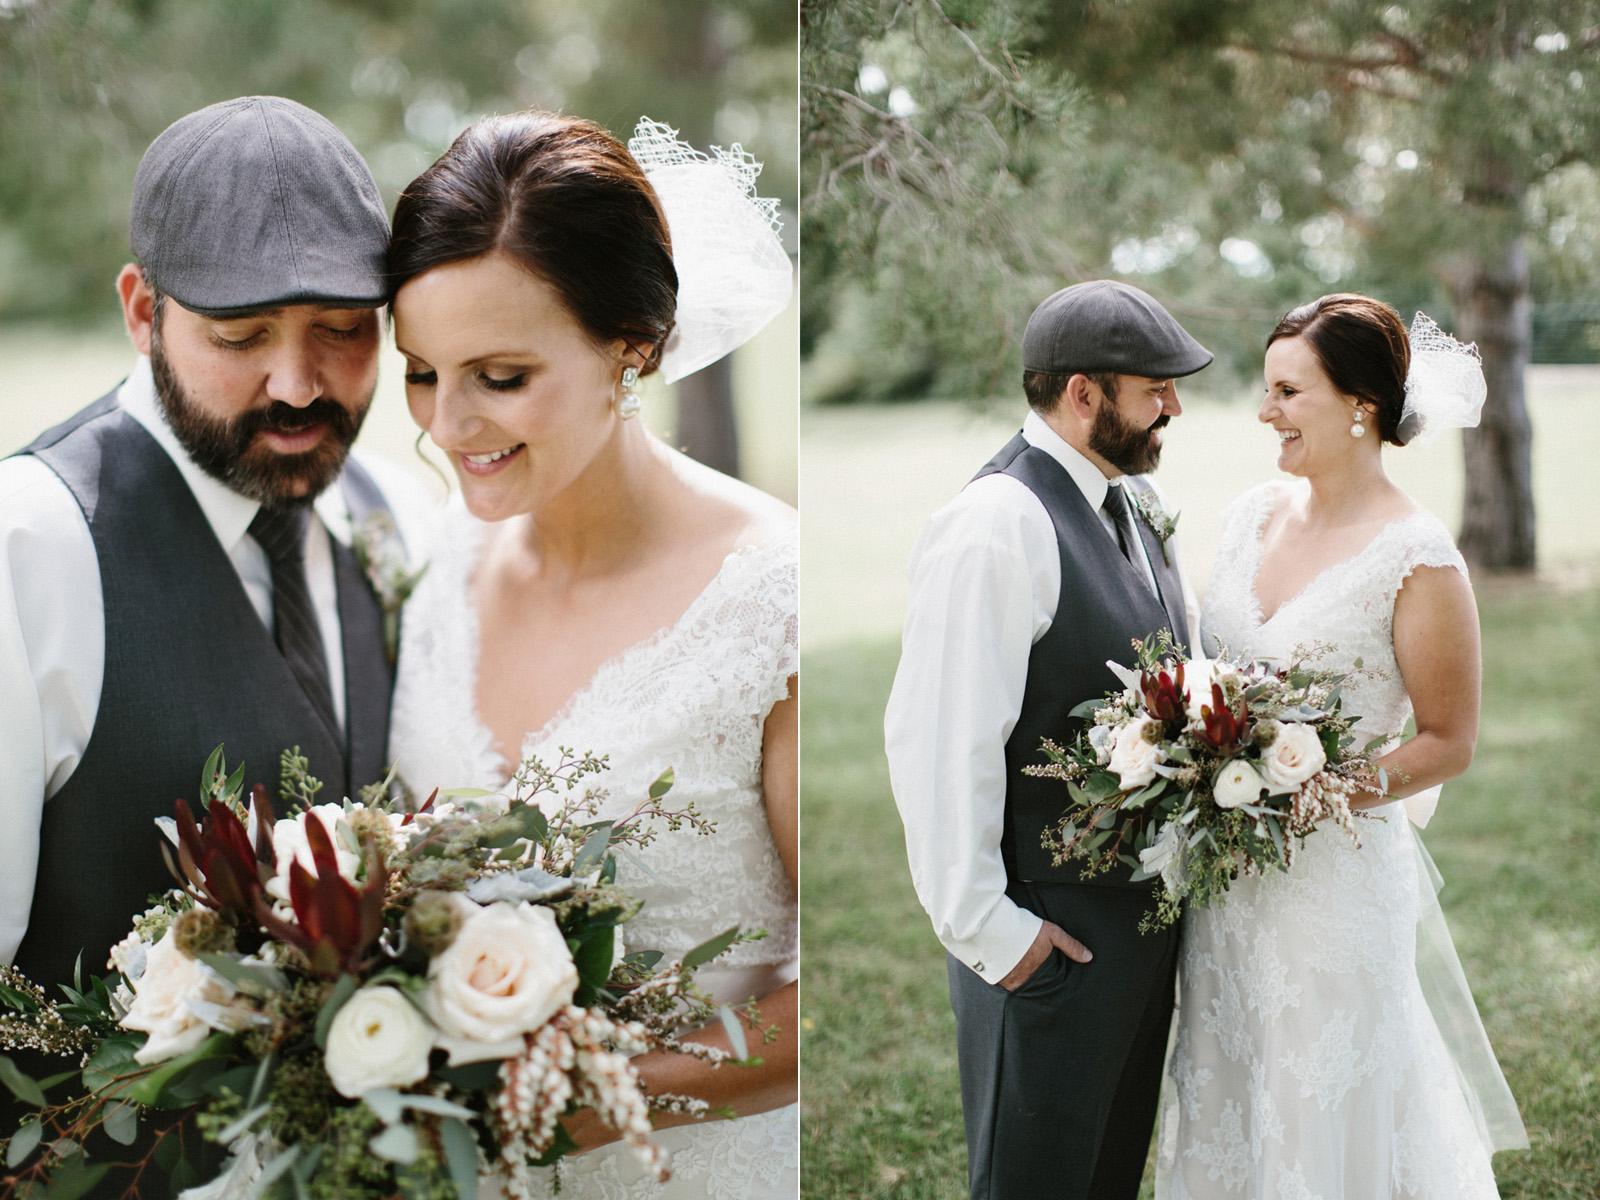 sioux_falls_desmoines_wedding_photographer_16.jpg